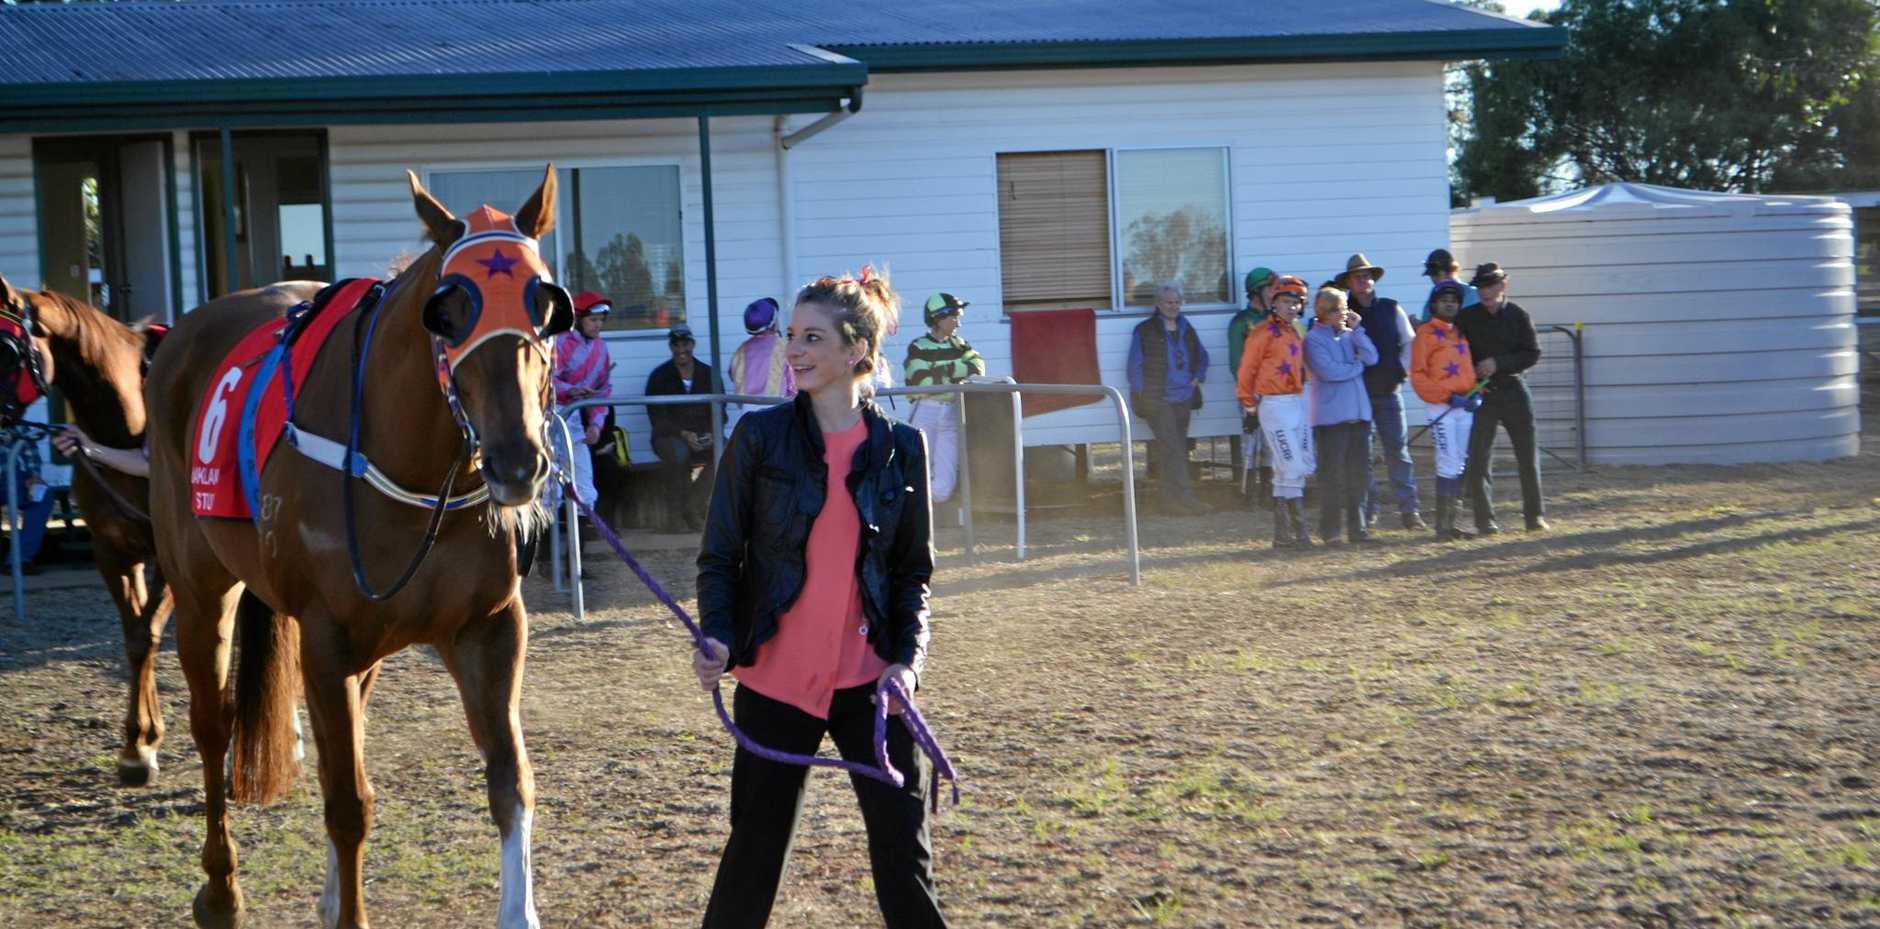 PROFESSIONAL JOCKEY: Shannyn Barlow leads one of her faithful steads. INSET: Shannyn Barlow in her debut race as a certified jockey.